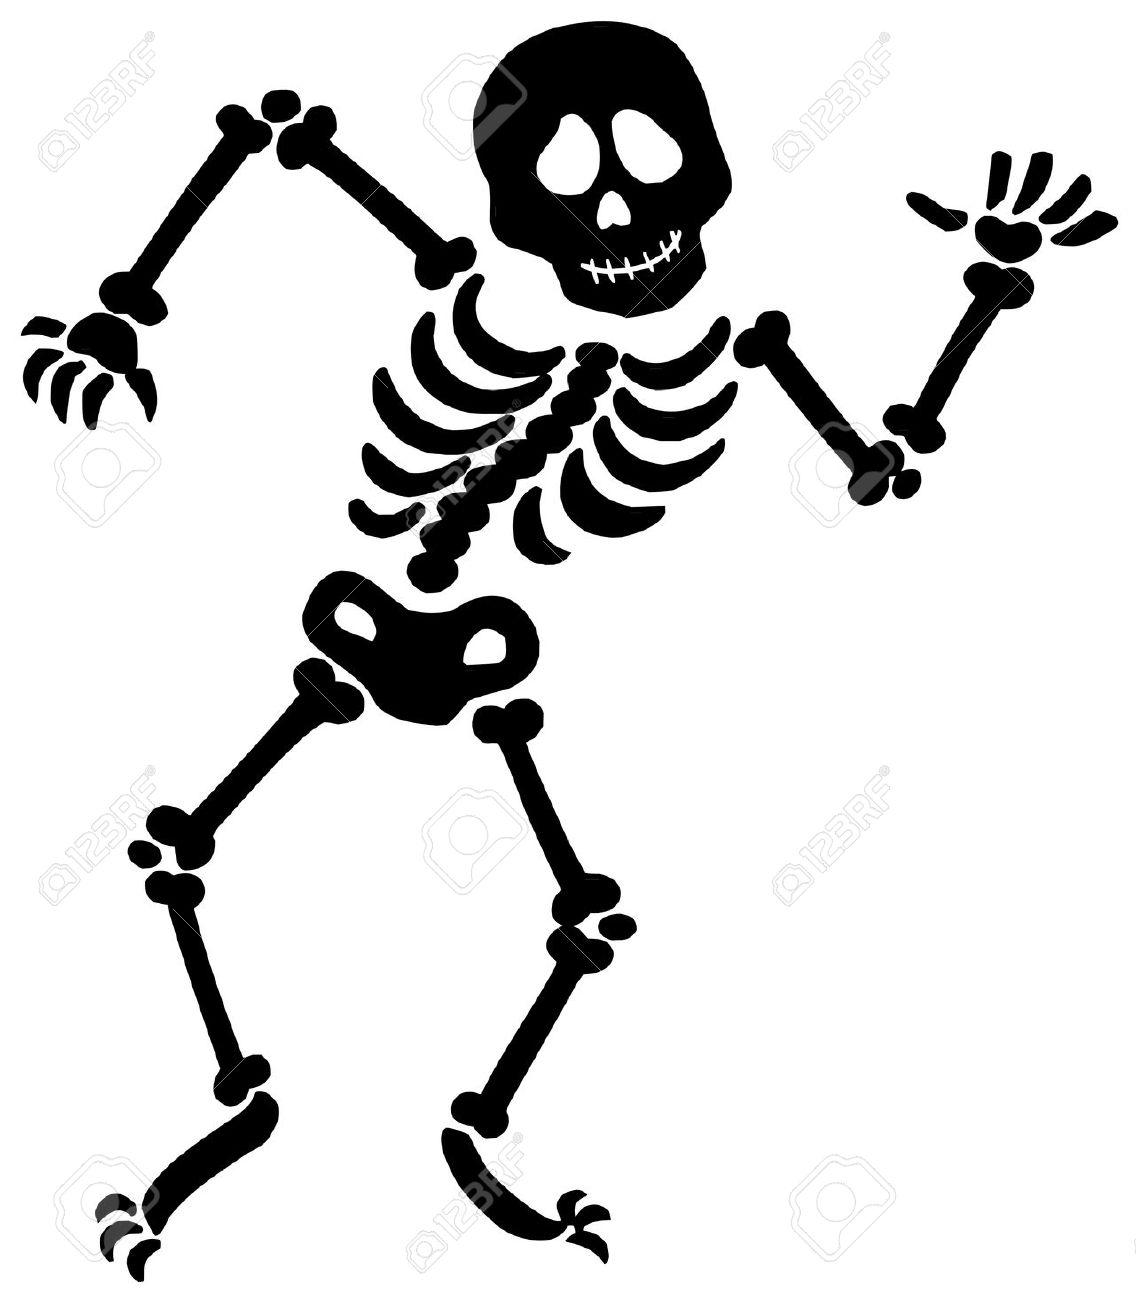 hight resolution of skeleton bones clipart 1 dancing skeleton silhouette